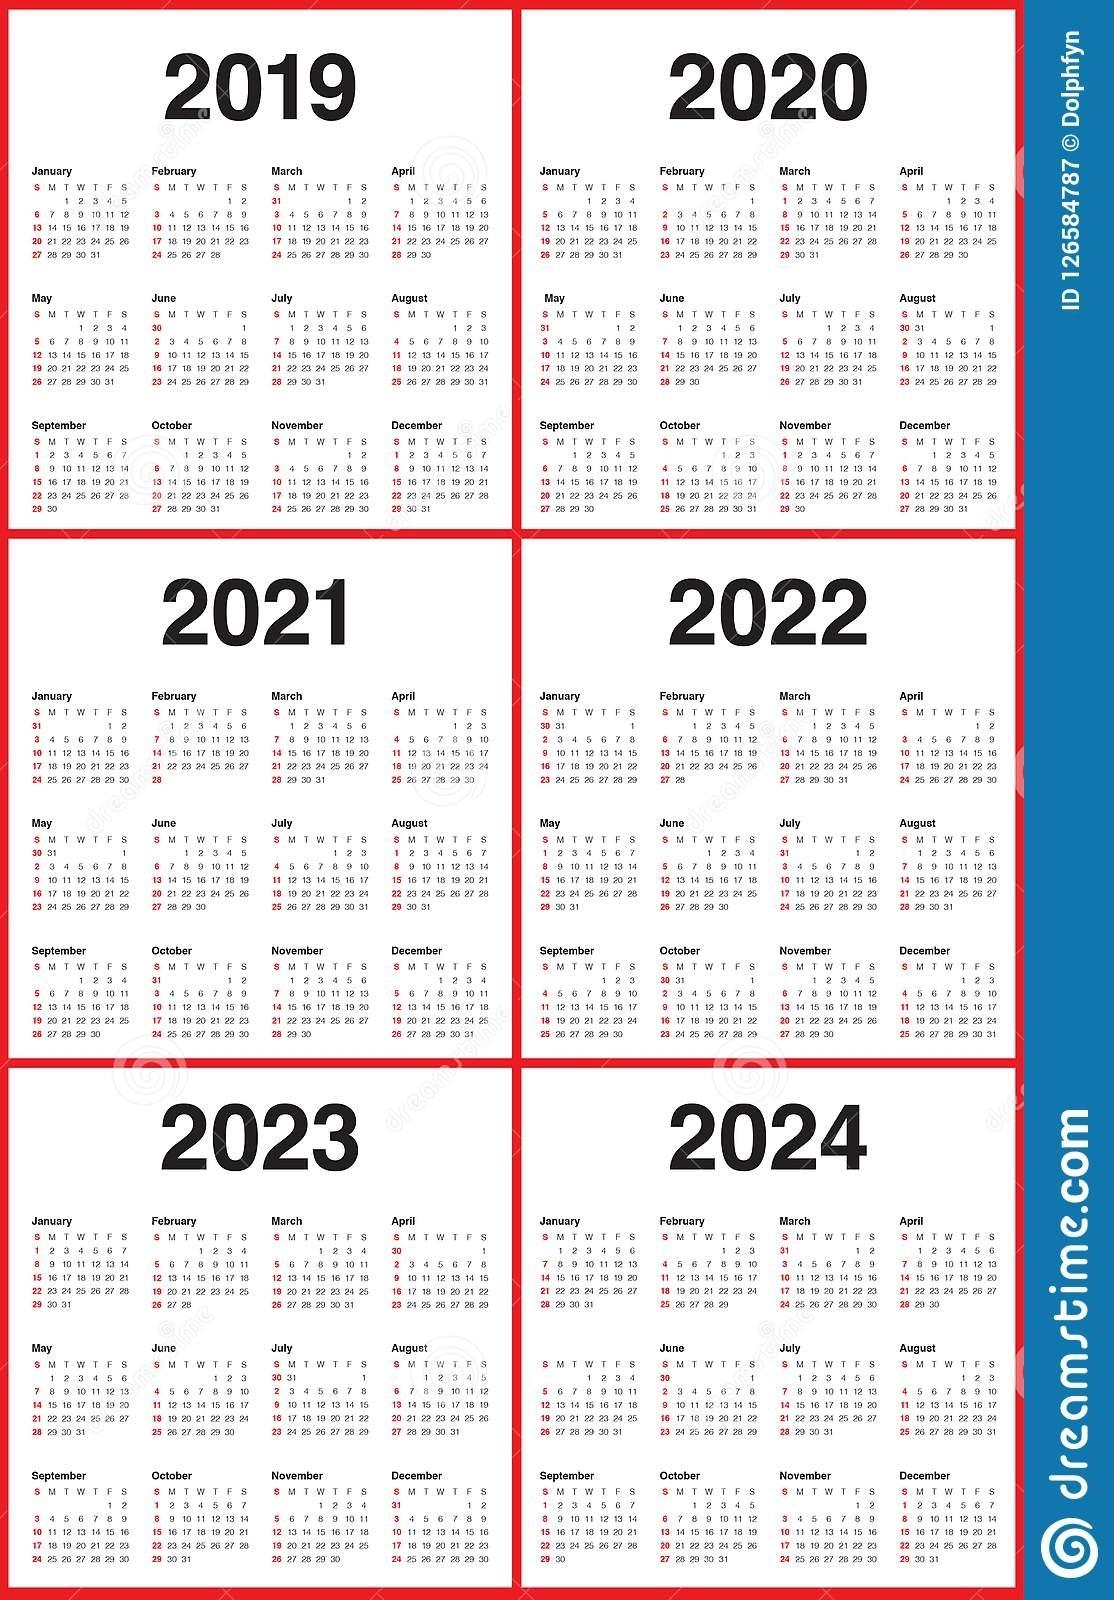 3 Year Calendar 2022 To 2024 | Ten Free Printable Calendar for 2021-2022 Three 3 Year Planner